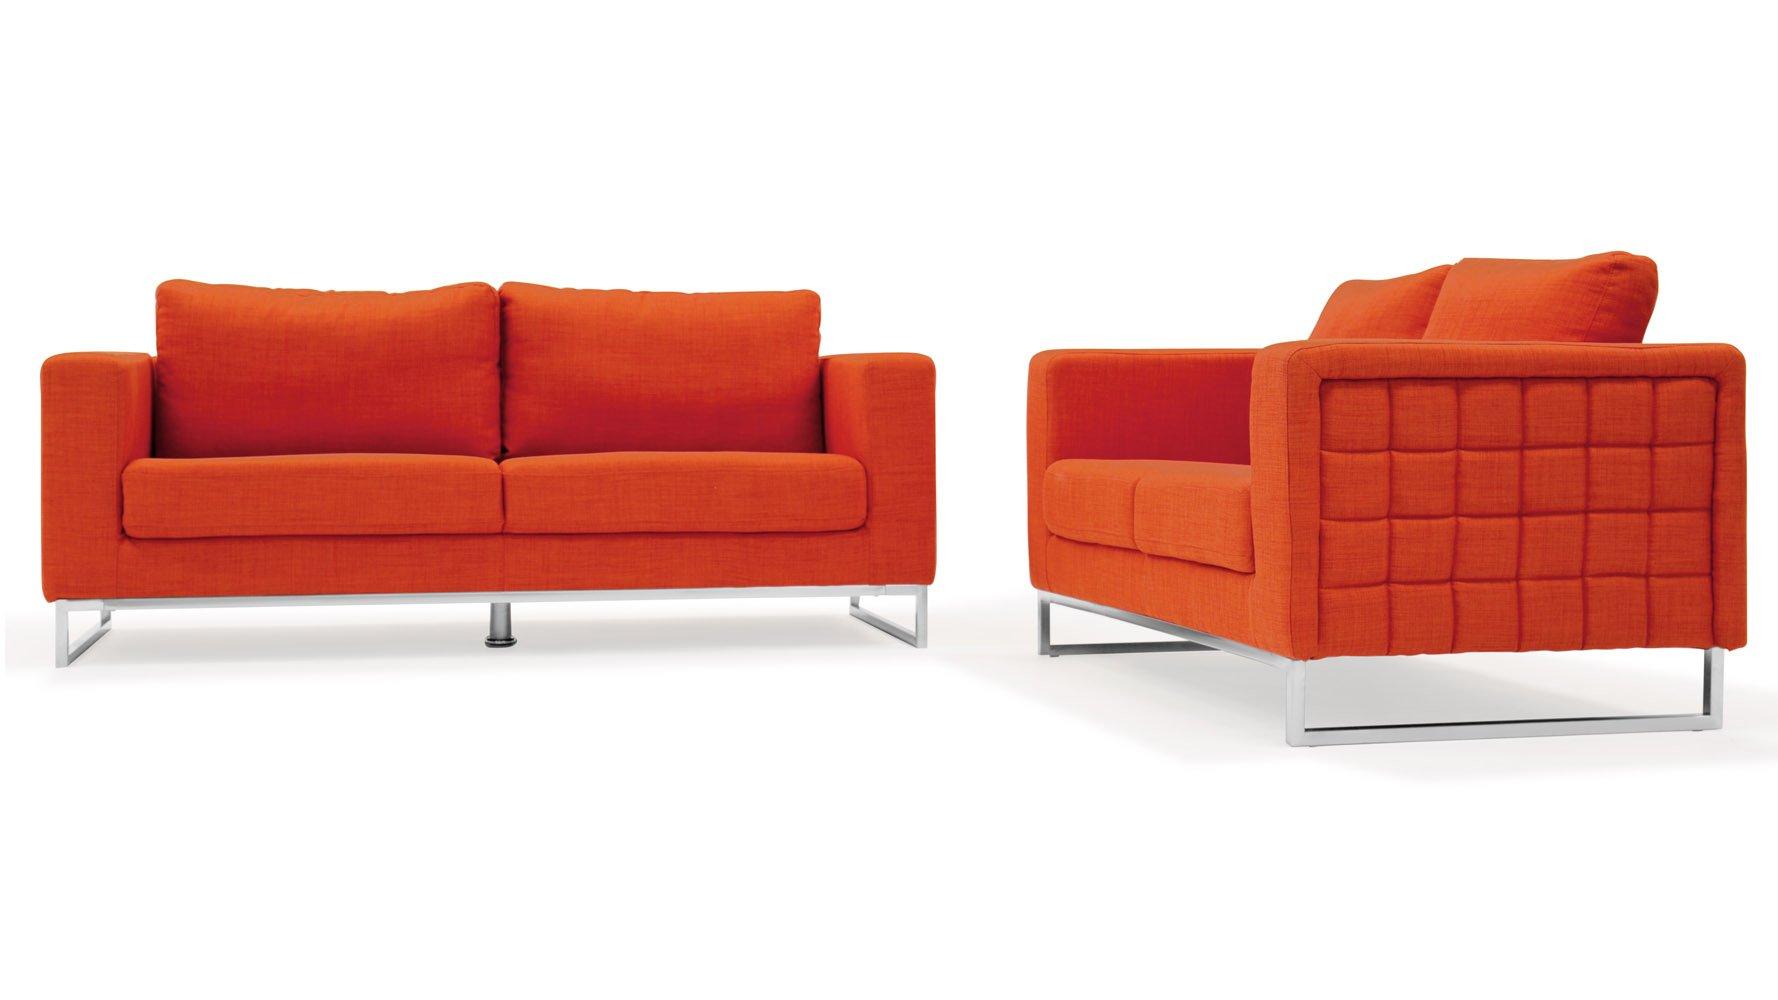 Modern Orange Fabric Upholstered 2 Piece Sofa Set With Stainless Steel Legs Zuri Furniture